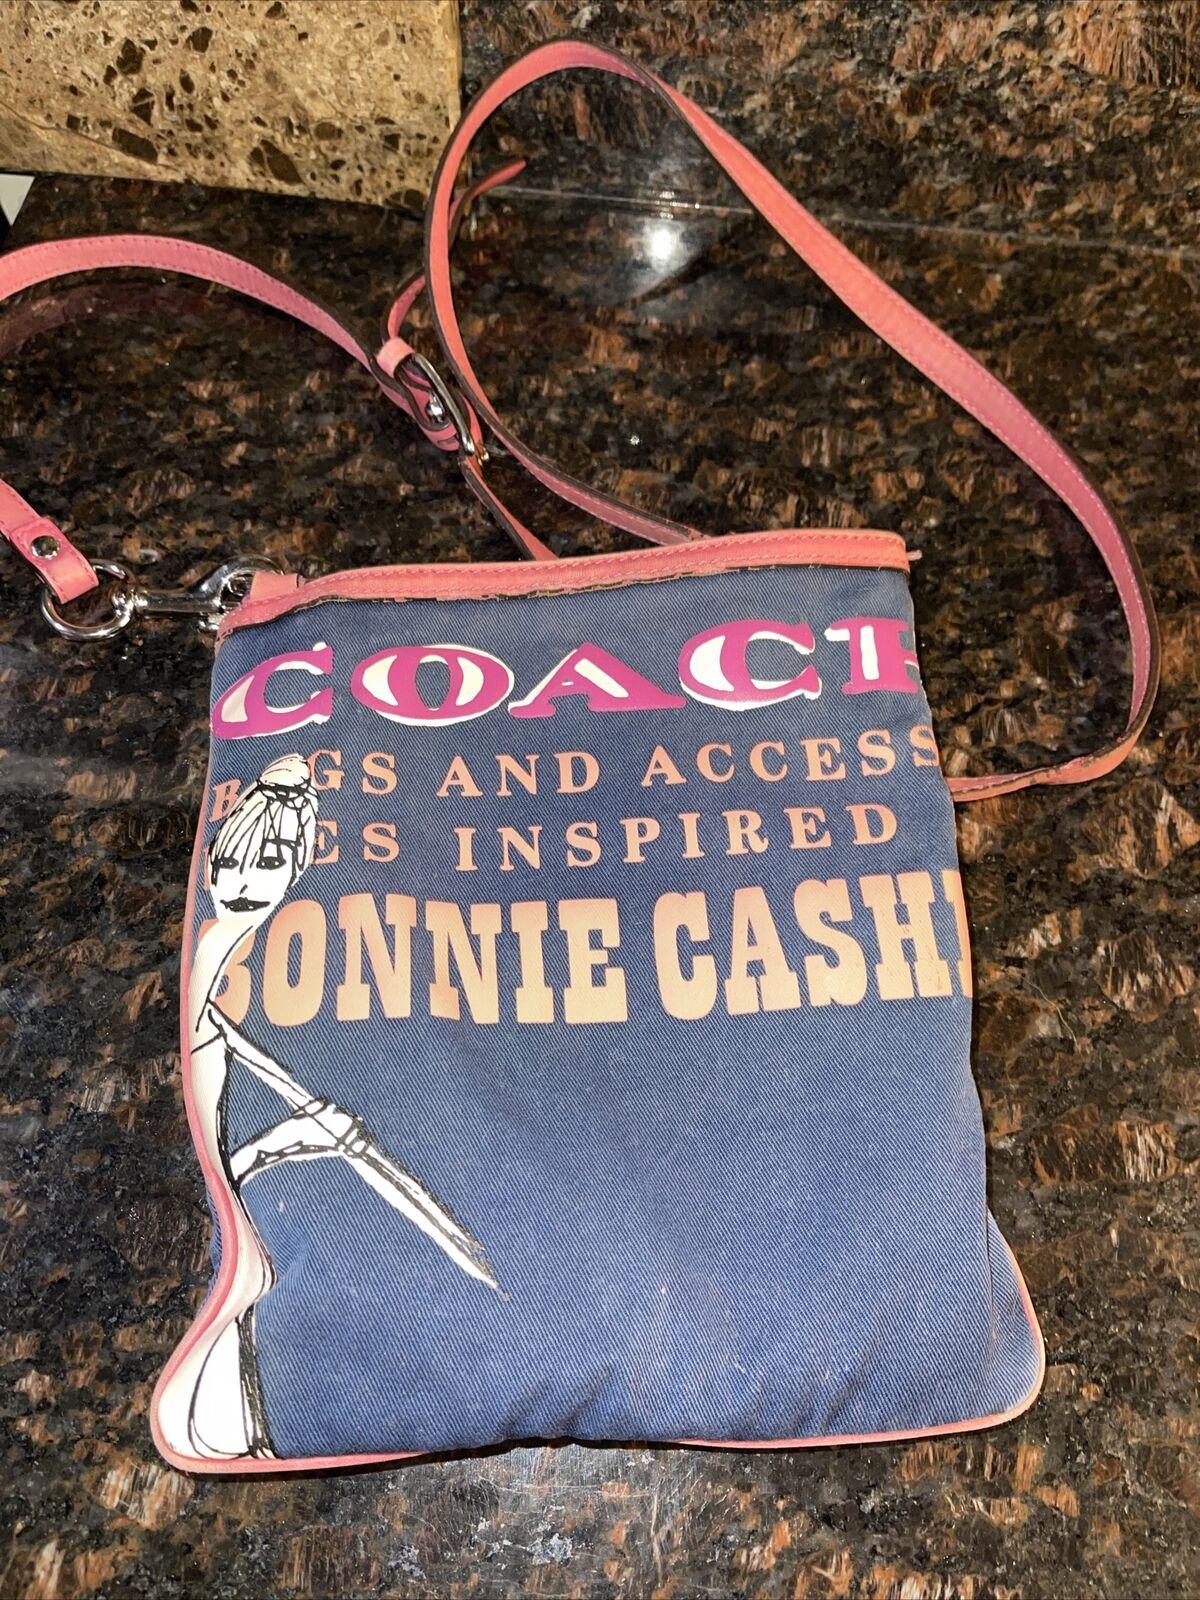 vintage coach bonnie cashin Crossbody - image 1